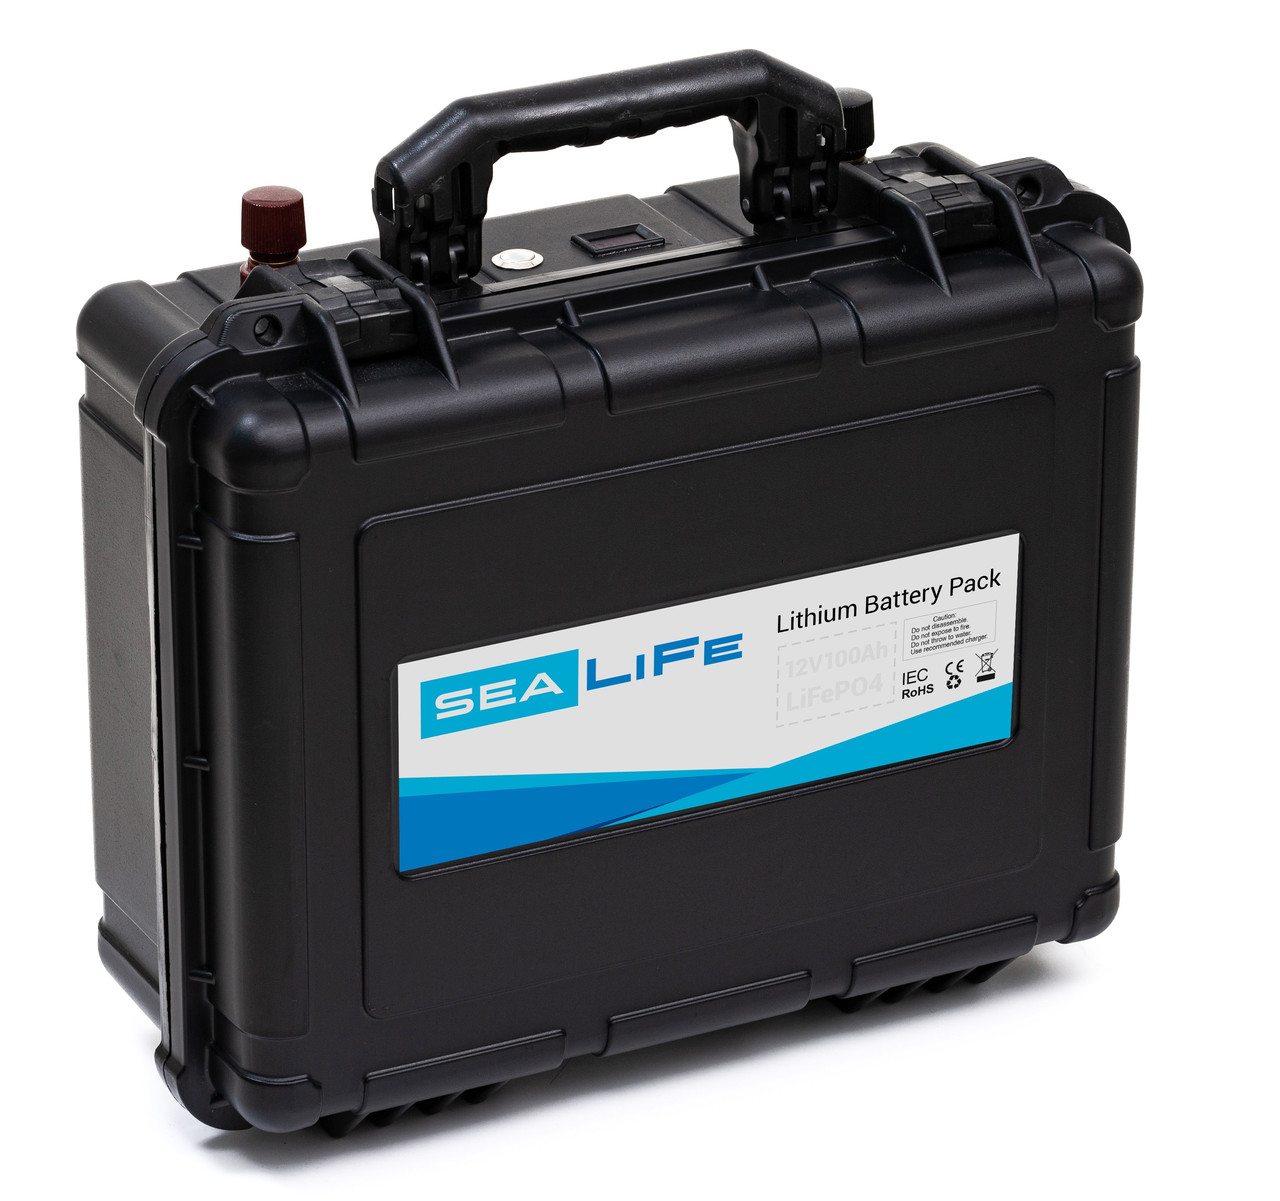 Литиевый аккумулятор 24В LiFePO4 116Ач Challenger Sealife 24-116